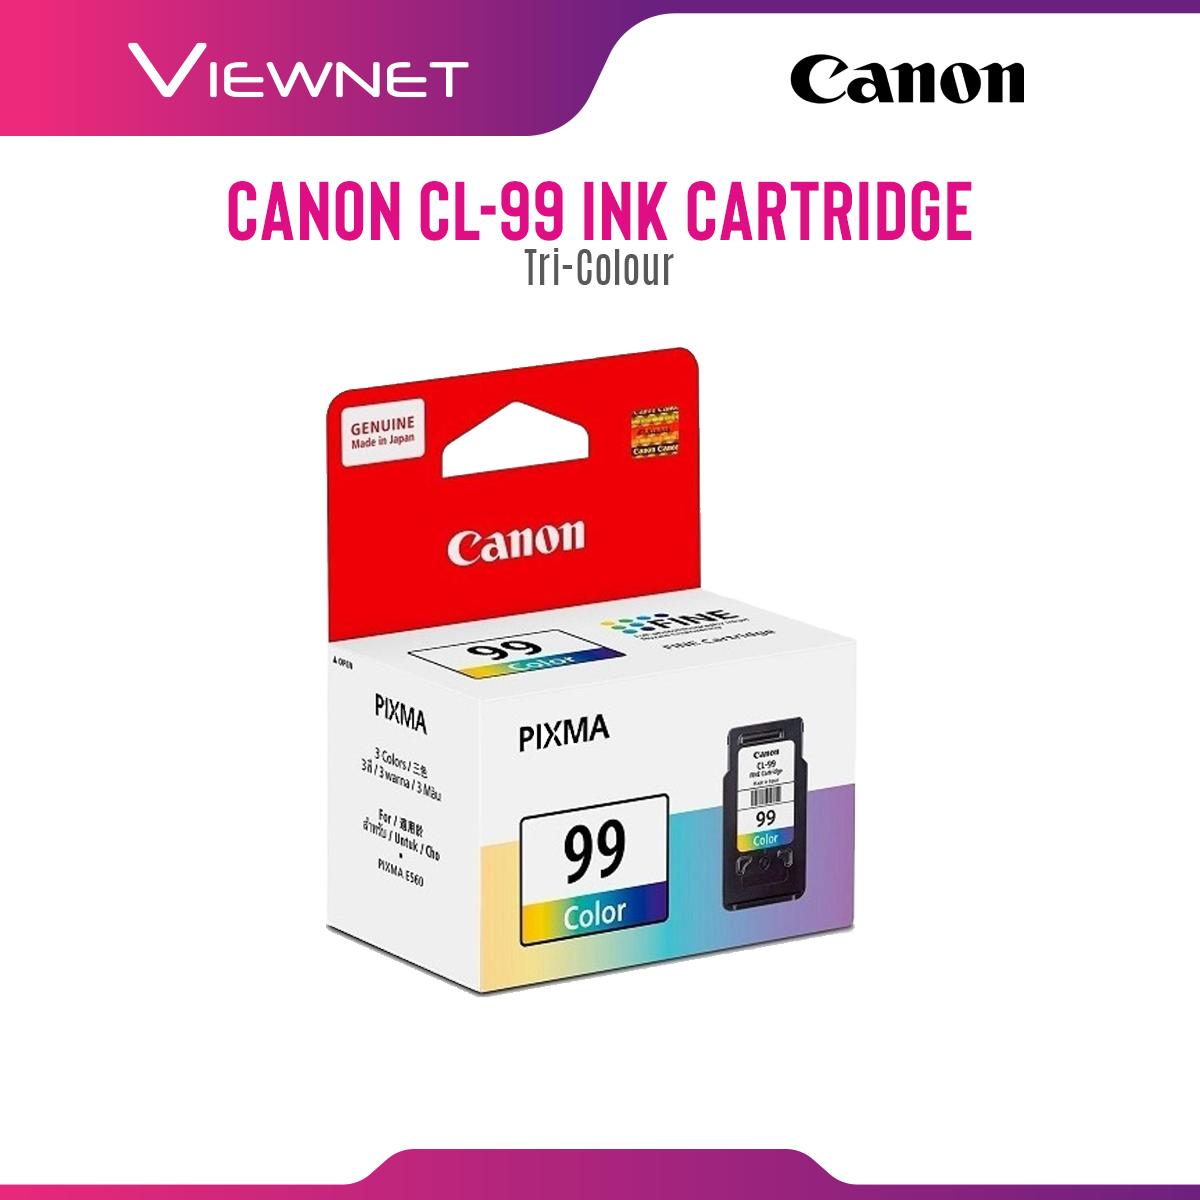 Canon PG-89 (Black), CL-99 (Color) Ink Cartridge for Printer Pixma E560